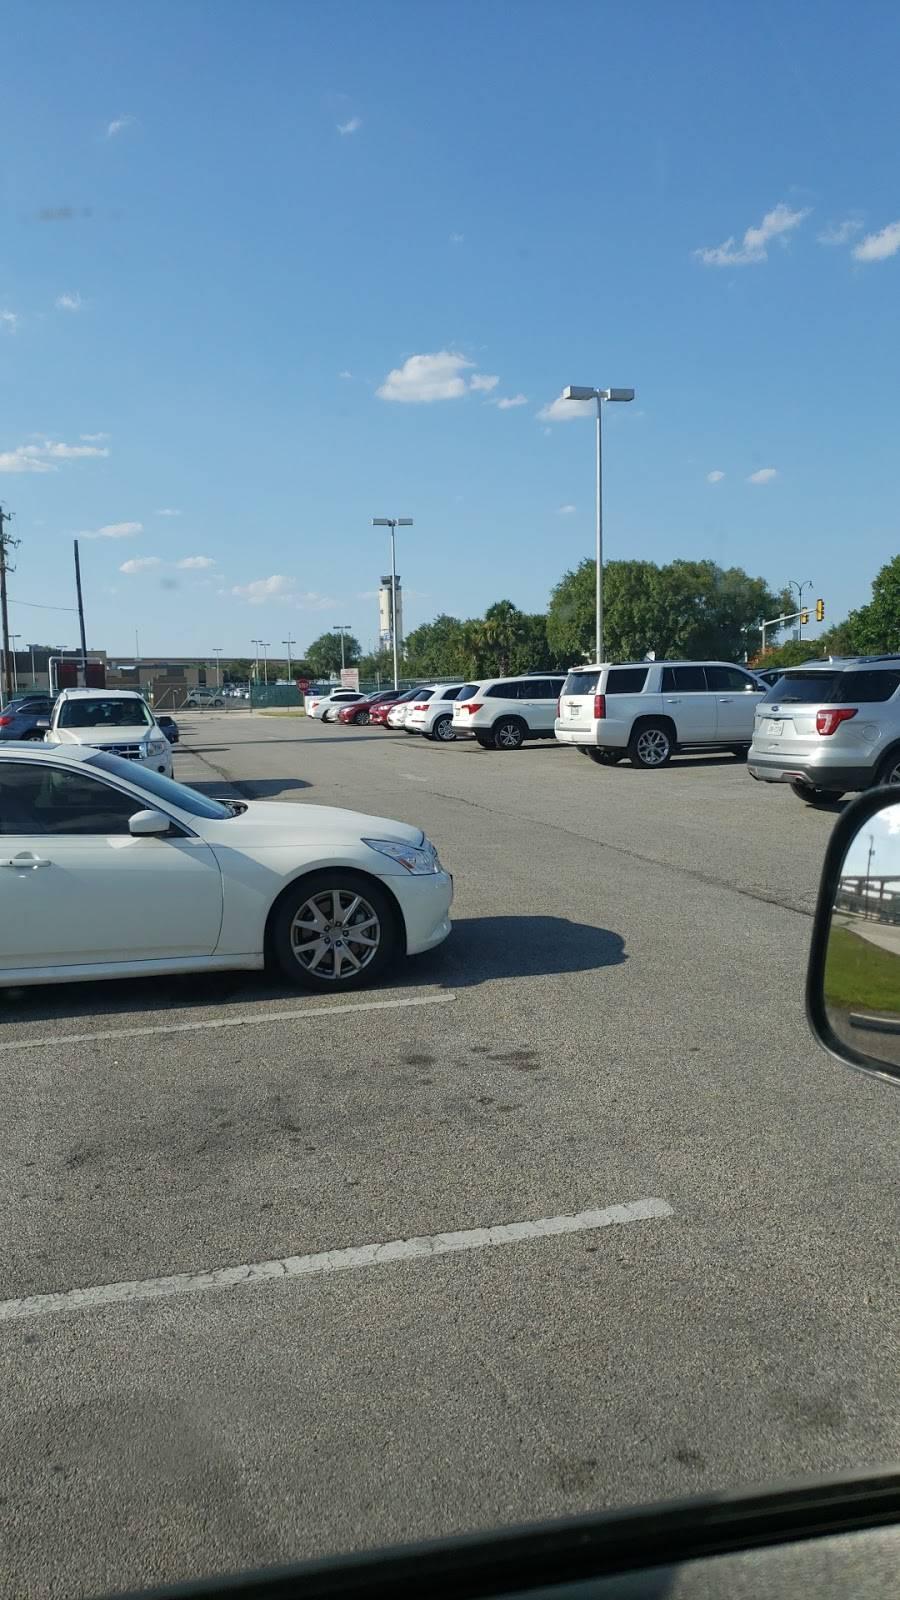 Cell Phone Waiting Lot - parking  | Photo 7 of 8 | Address: Airport Blvd, San Antonio, TX 78216, USA | Phone: (210) 207-3433